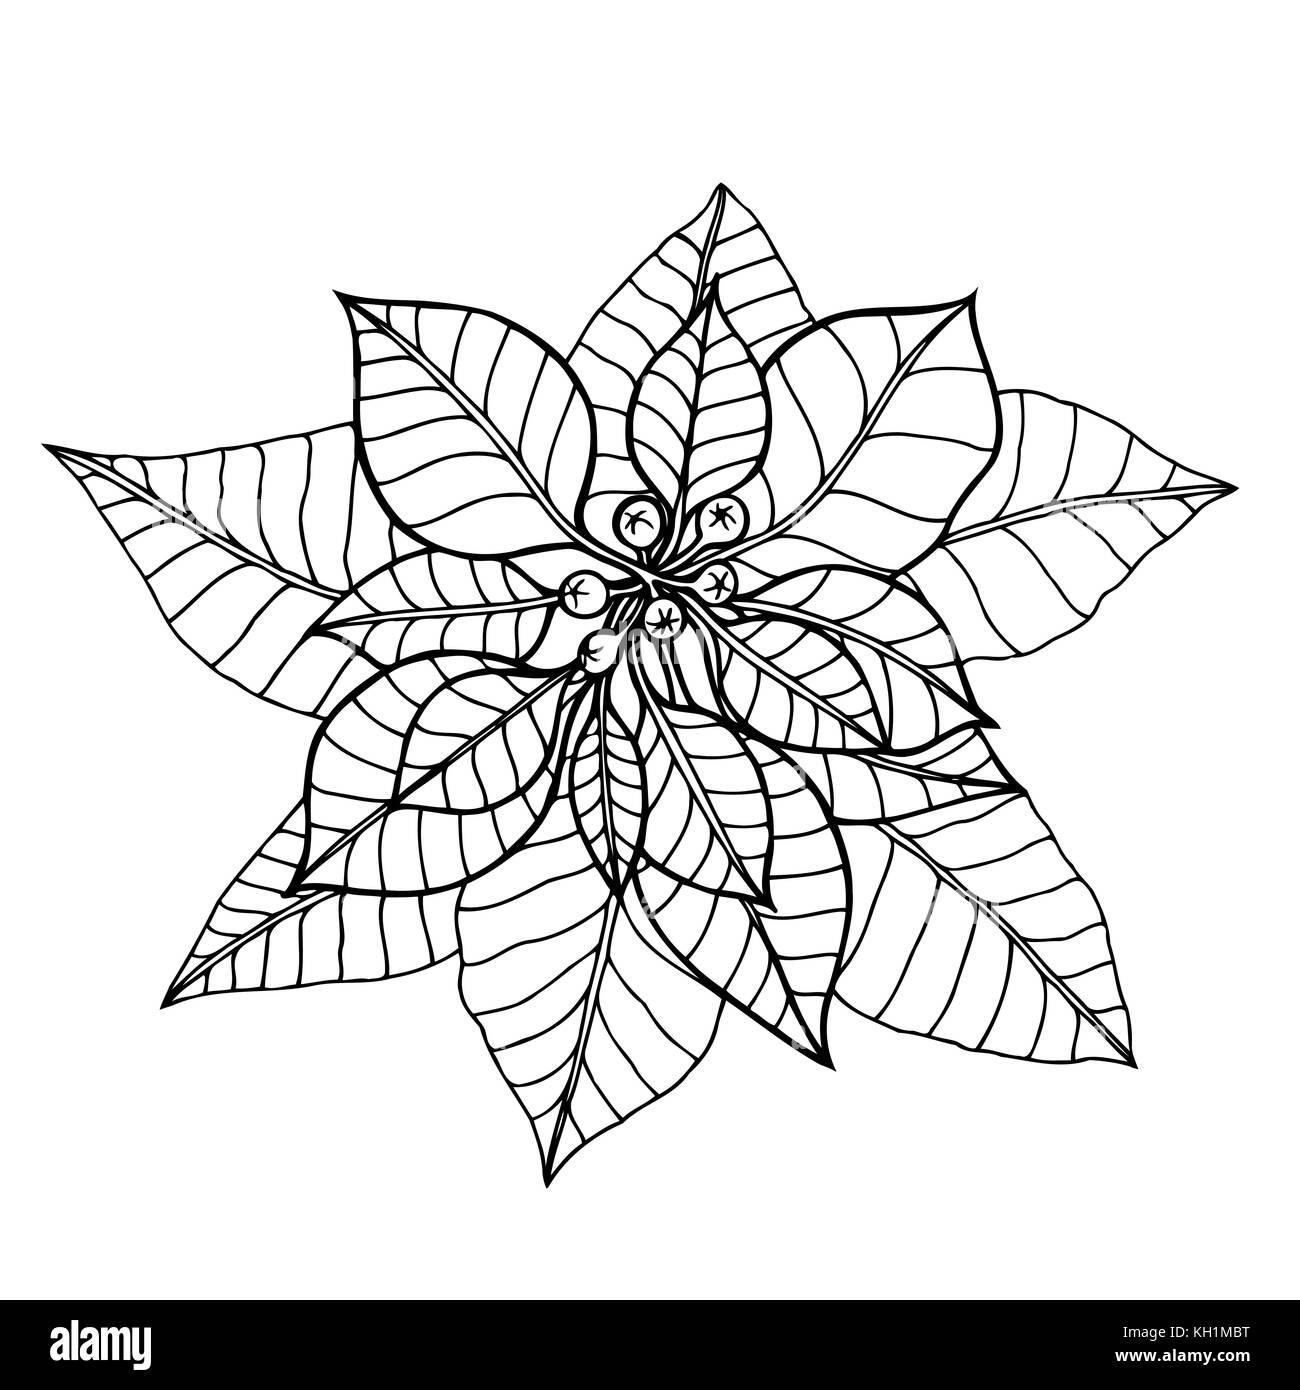 hand drawn vector illustration poinsettia christmas flower